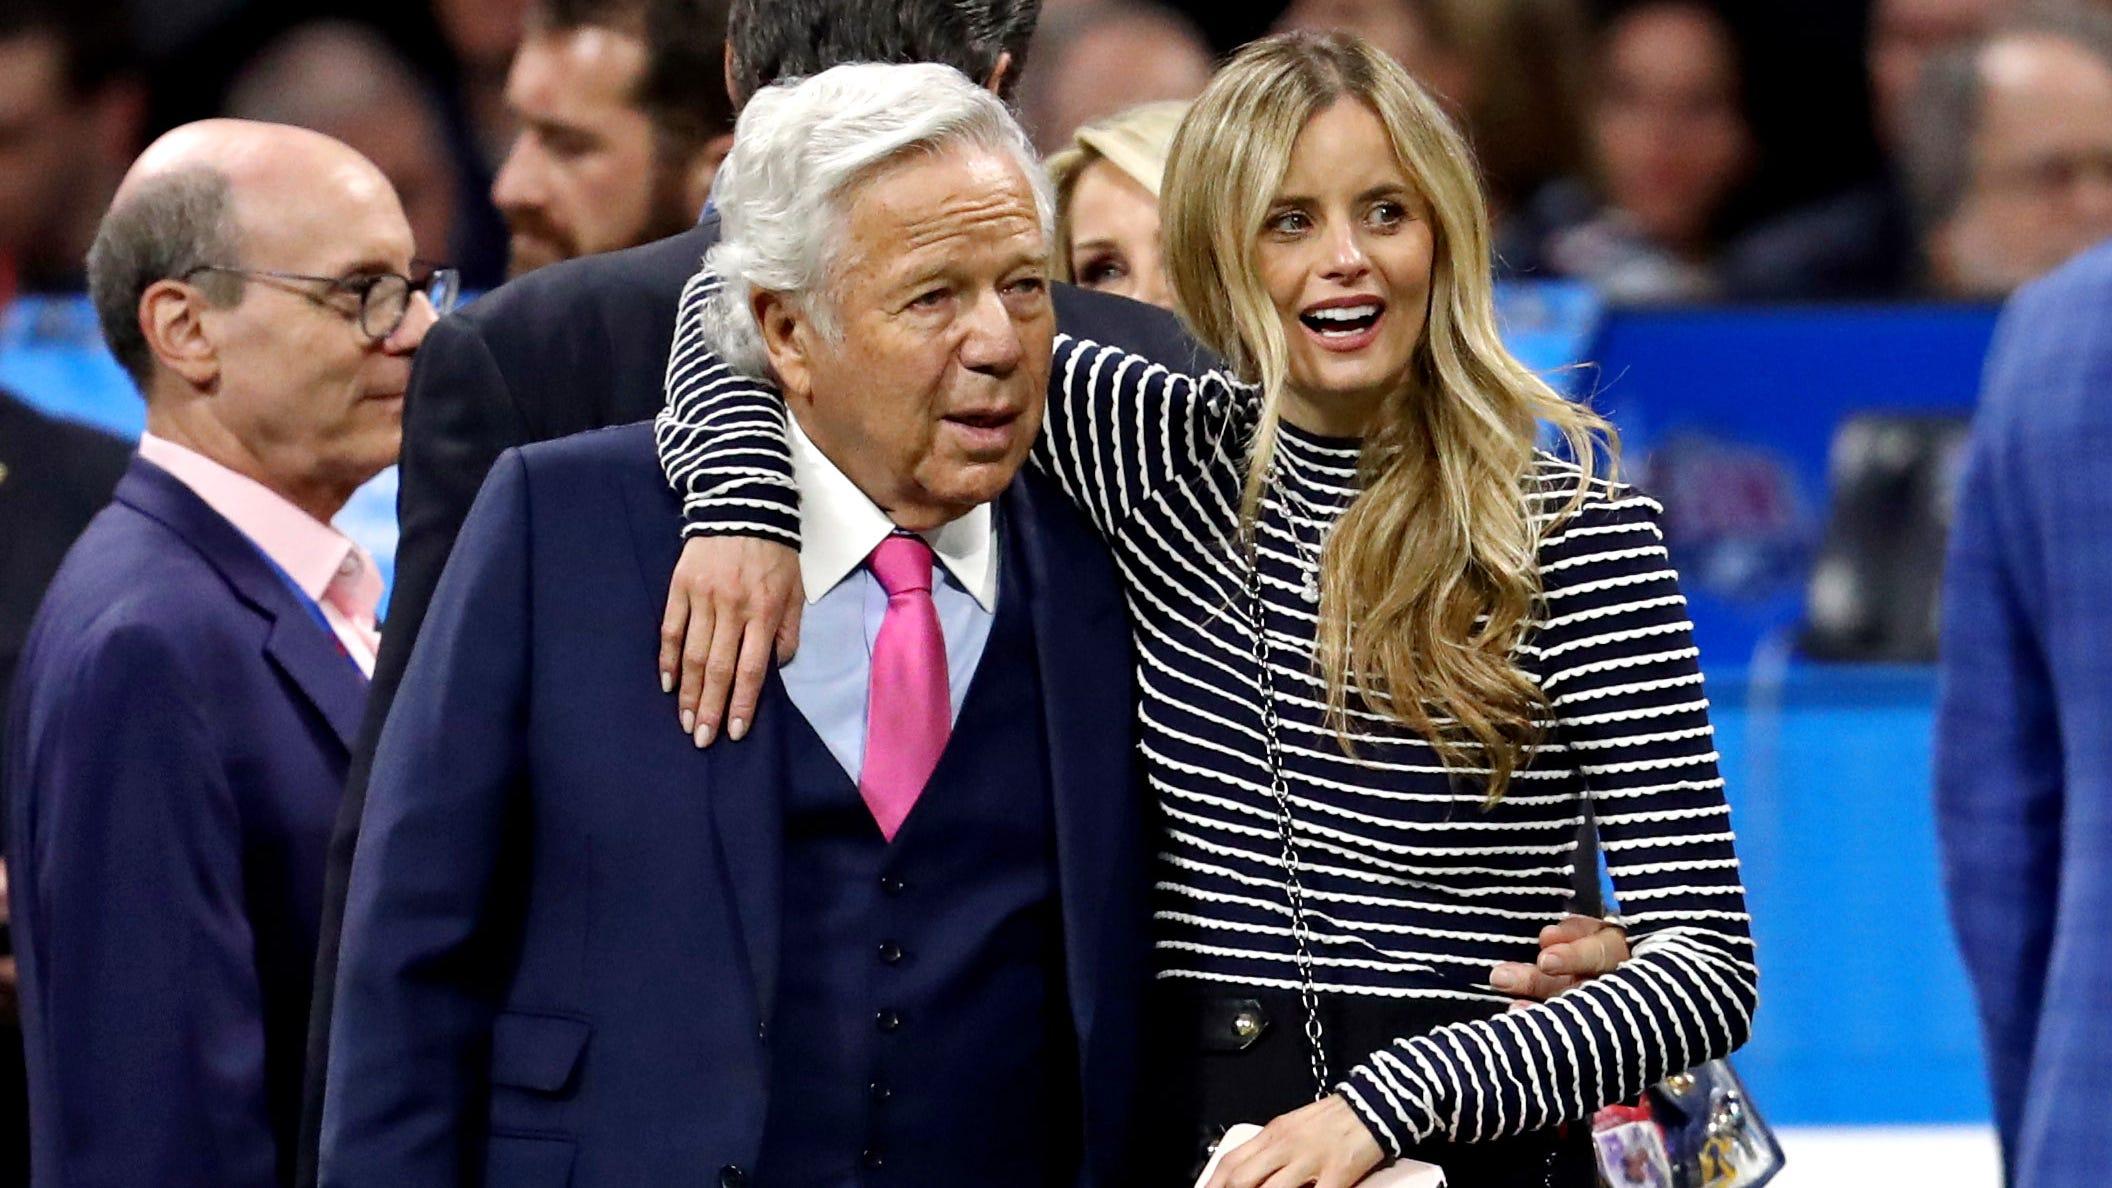 Patriots owner Robert Kraft and his girlfriend, Ricki Noel Lander, watched pregame festivities at Mercedes-Benz Stadium before Super Bowl LIII.